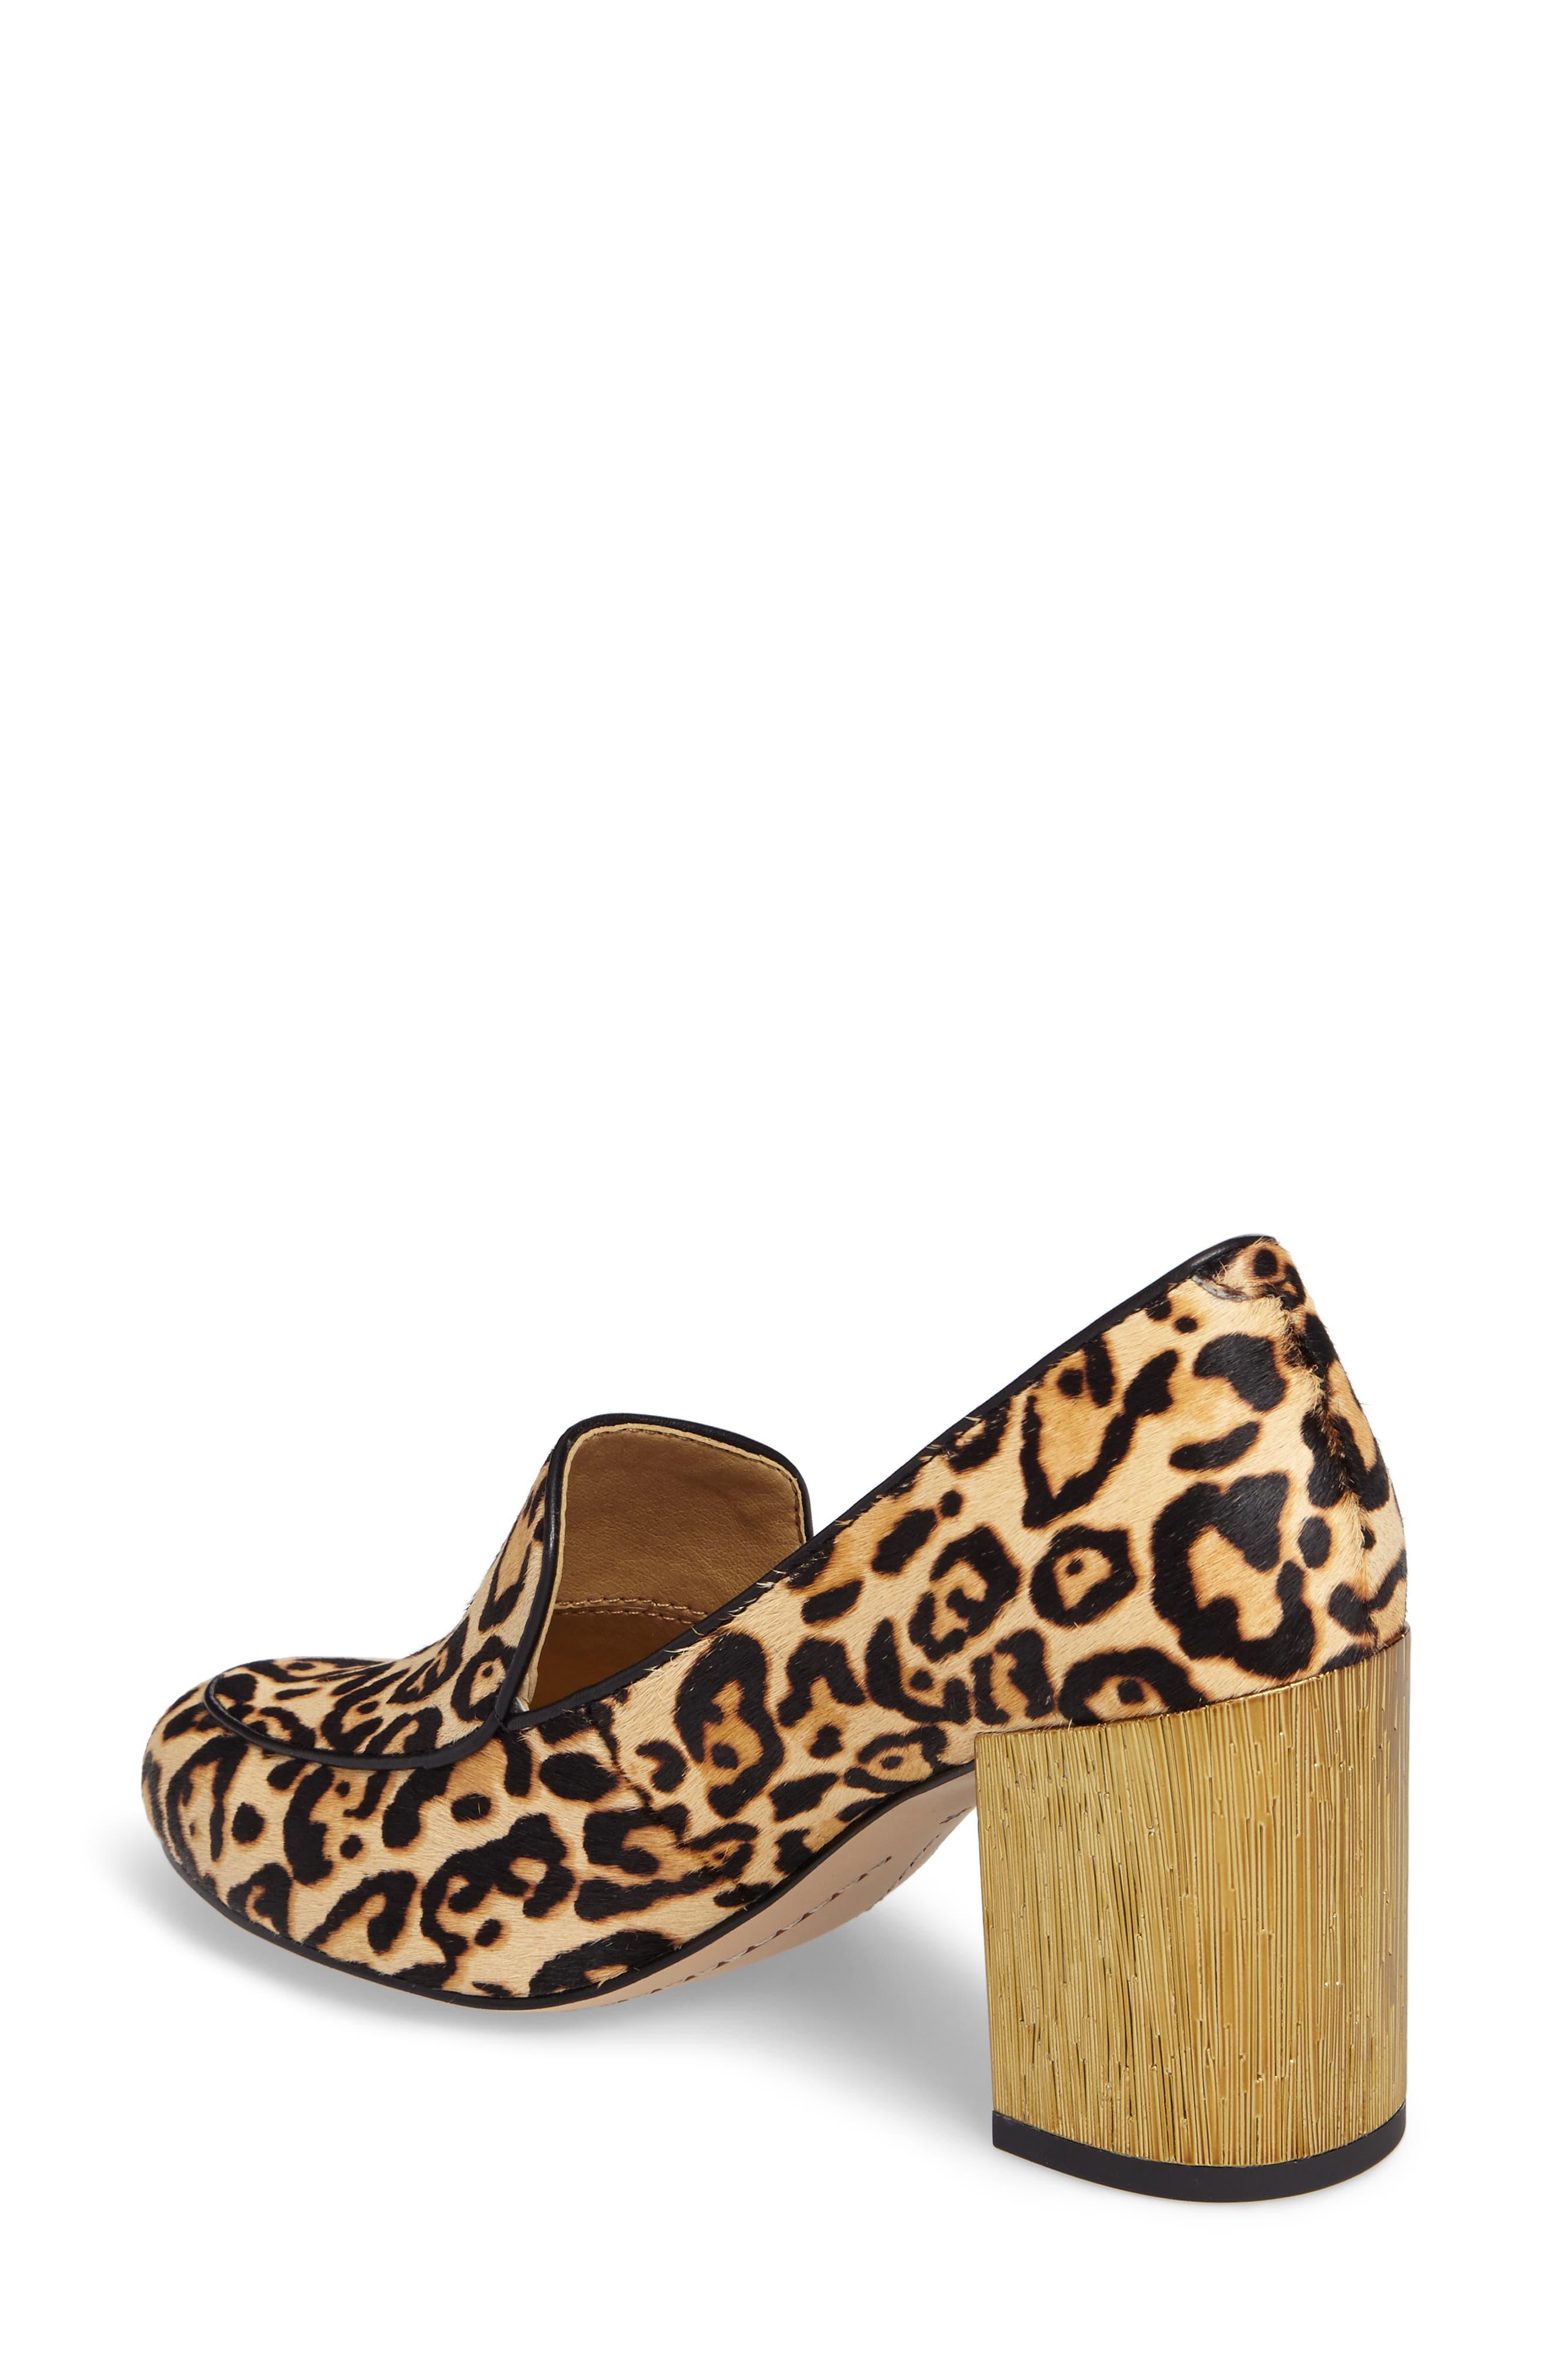 Rosita III Genuine Calf Hair Loafer Pump,                             Alternate thumbnail 2, color,                             200